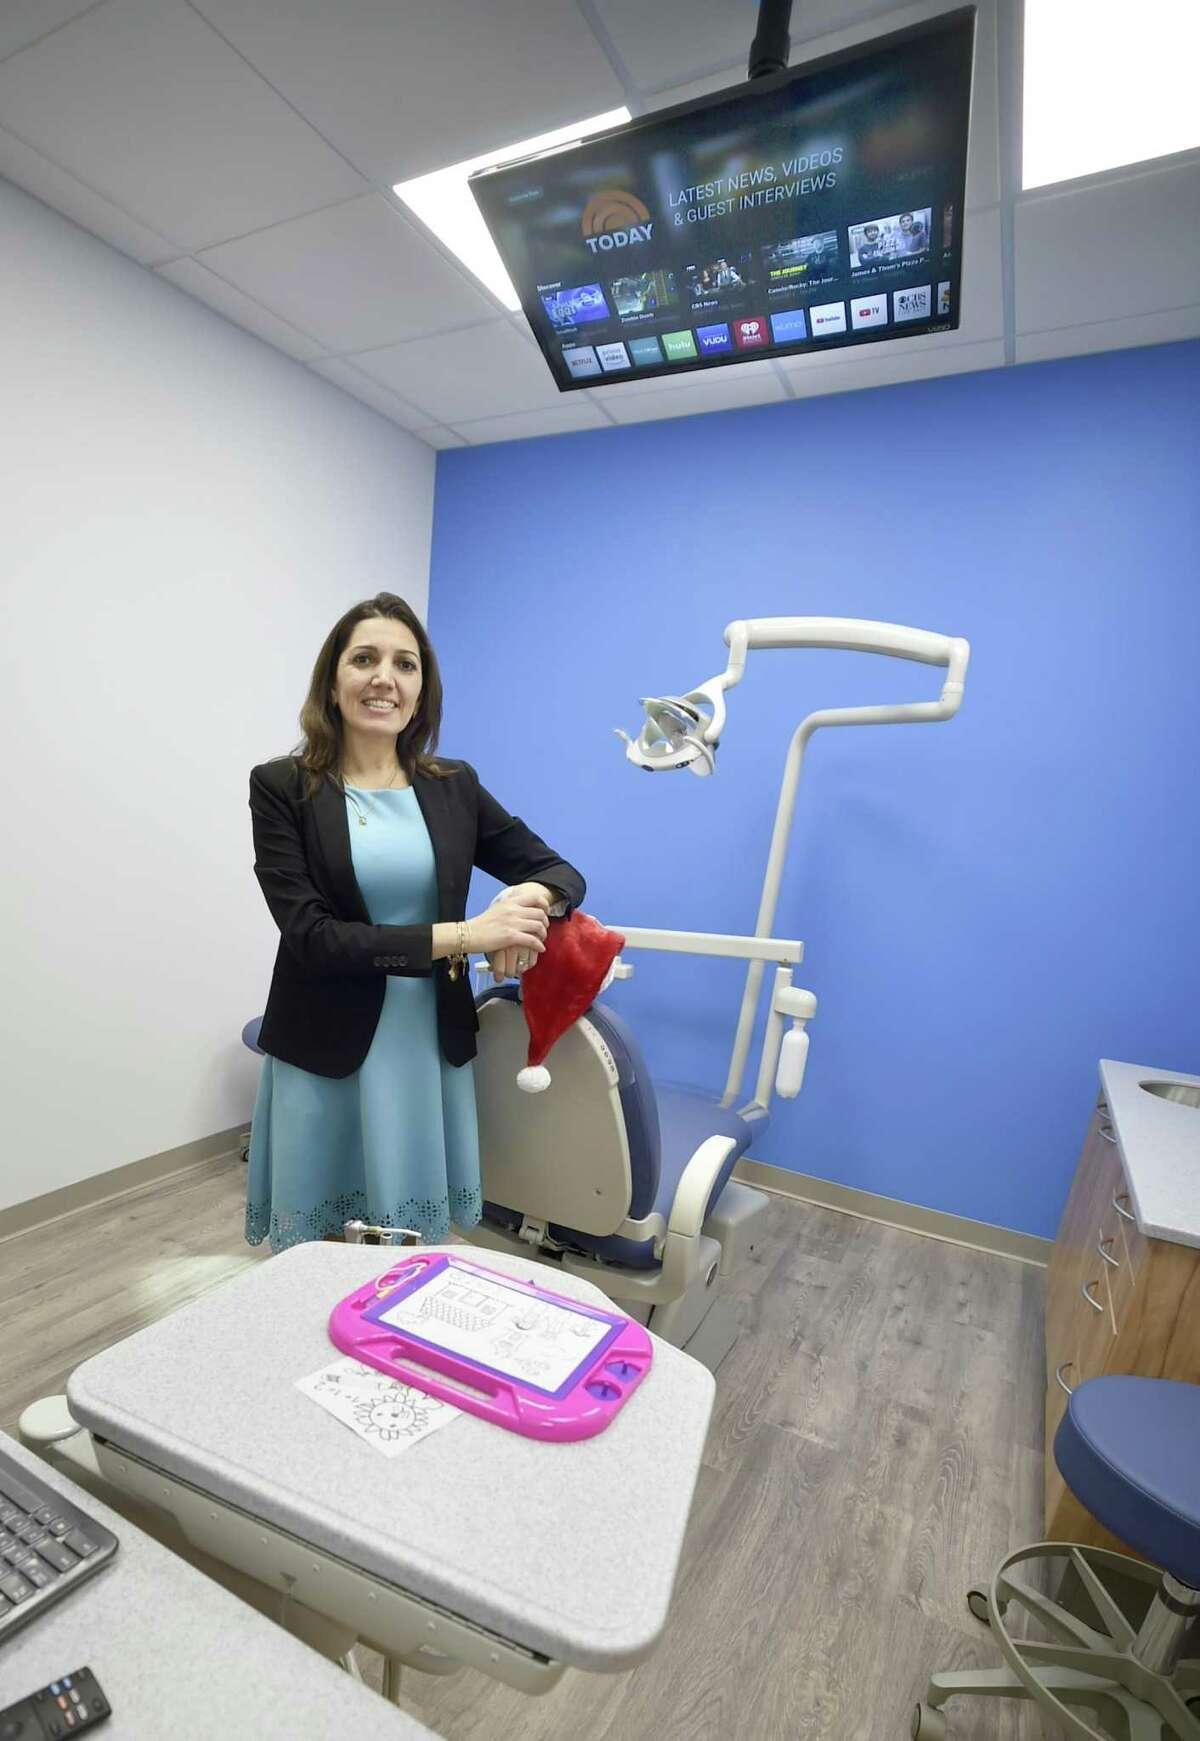 Pediatric Dentist Paula C. Cerqueira, DMD, in her new dental office, Orange Children's Dentistry on the Boston Post Road in Orange on Tuesday, Dec. 11, 2018.